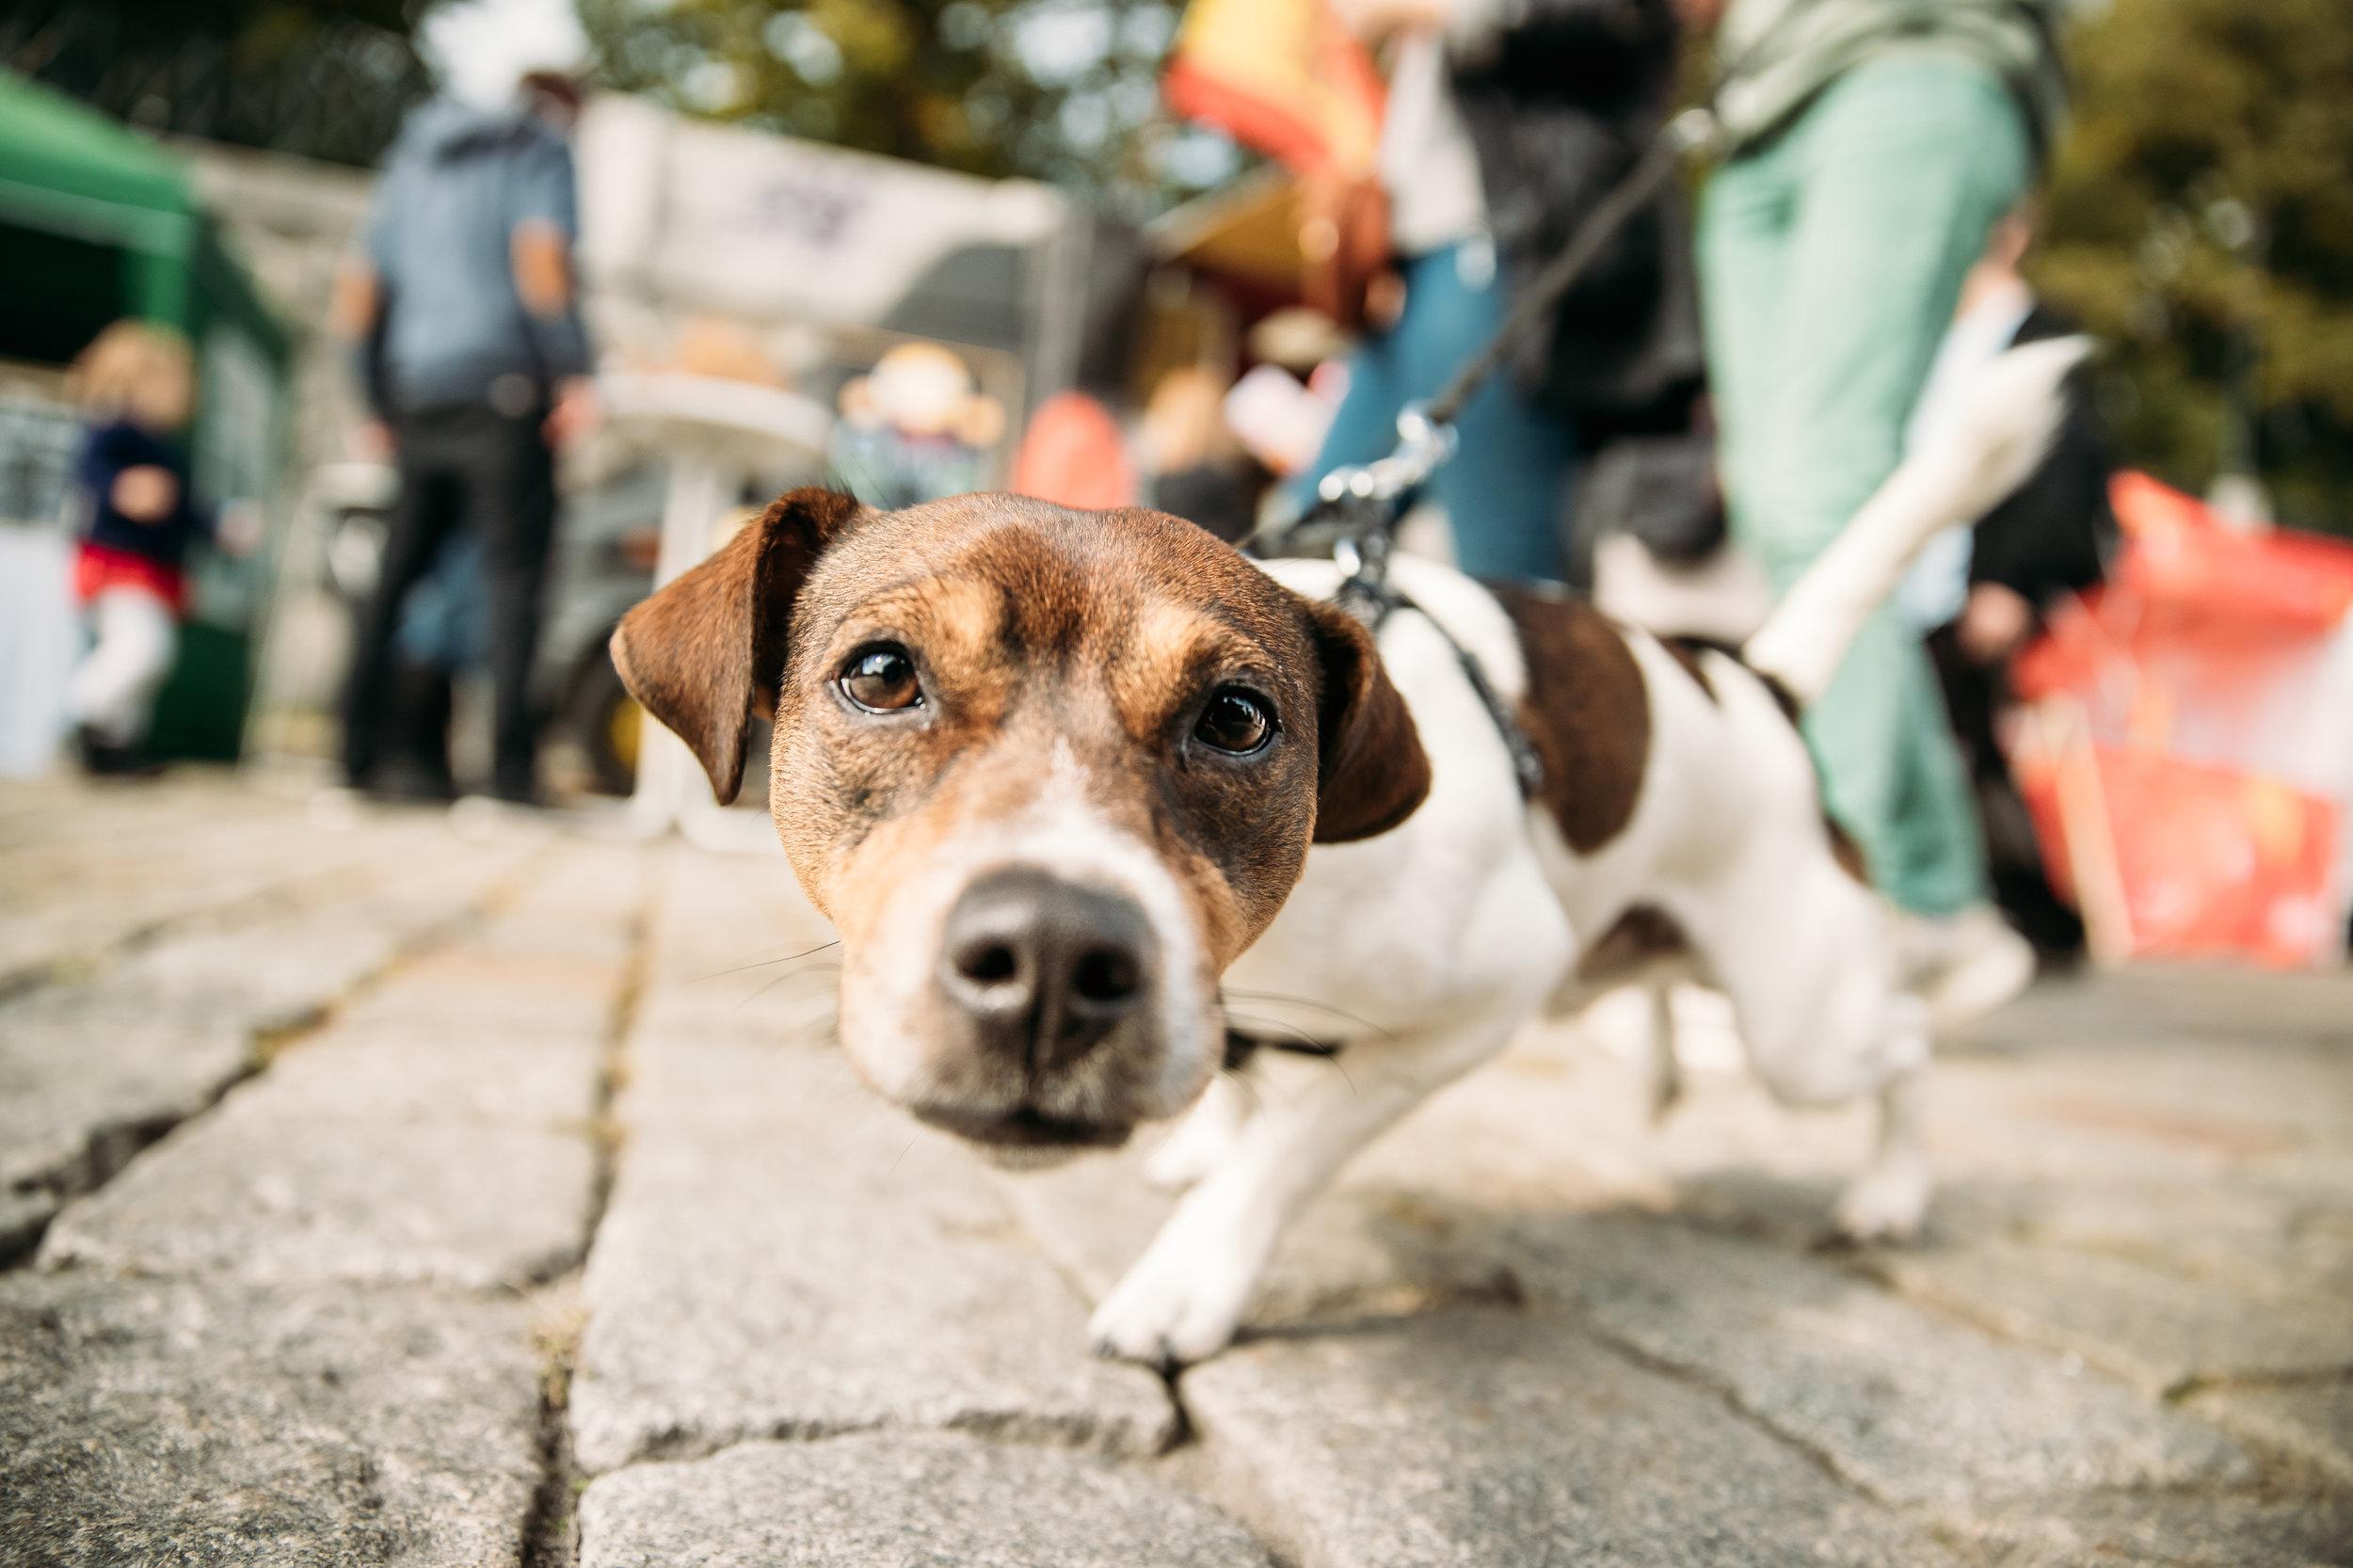 funny-jack-russell-terrier-dog-walks-down-street-QBWNF6E.jpg